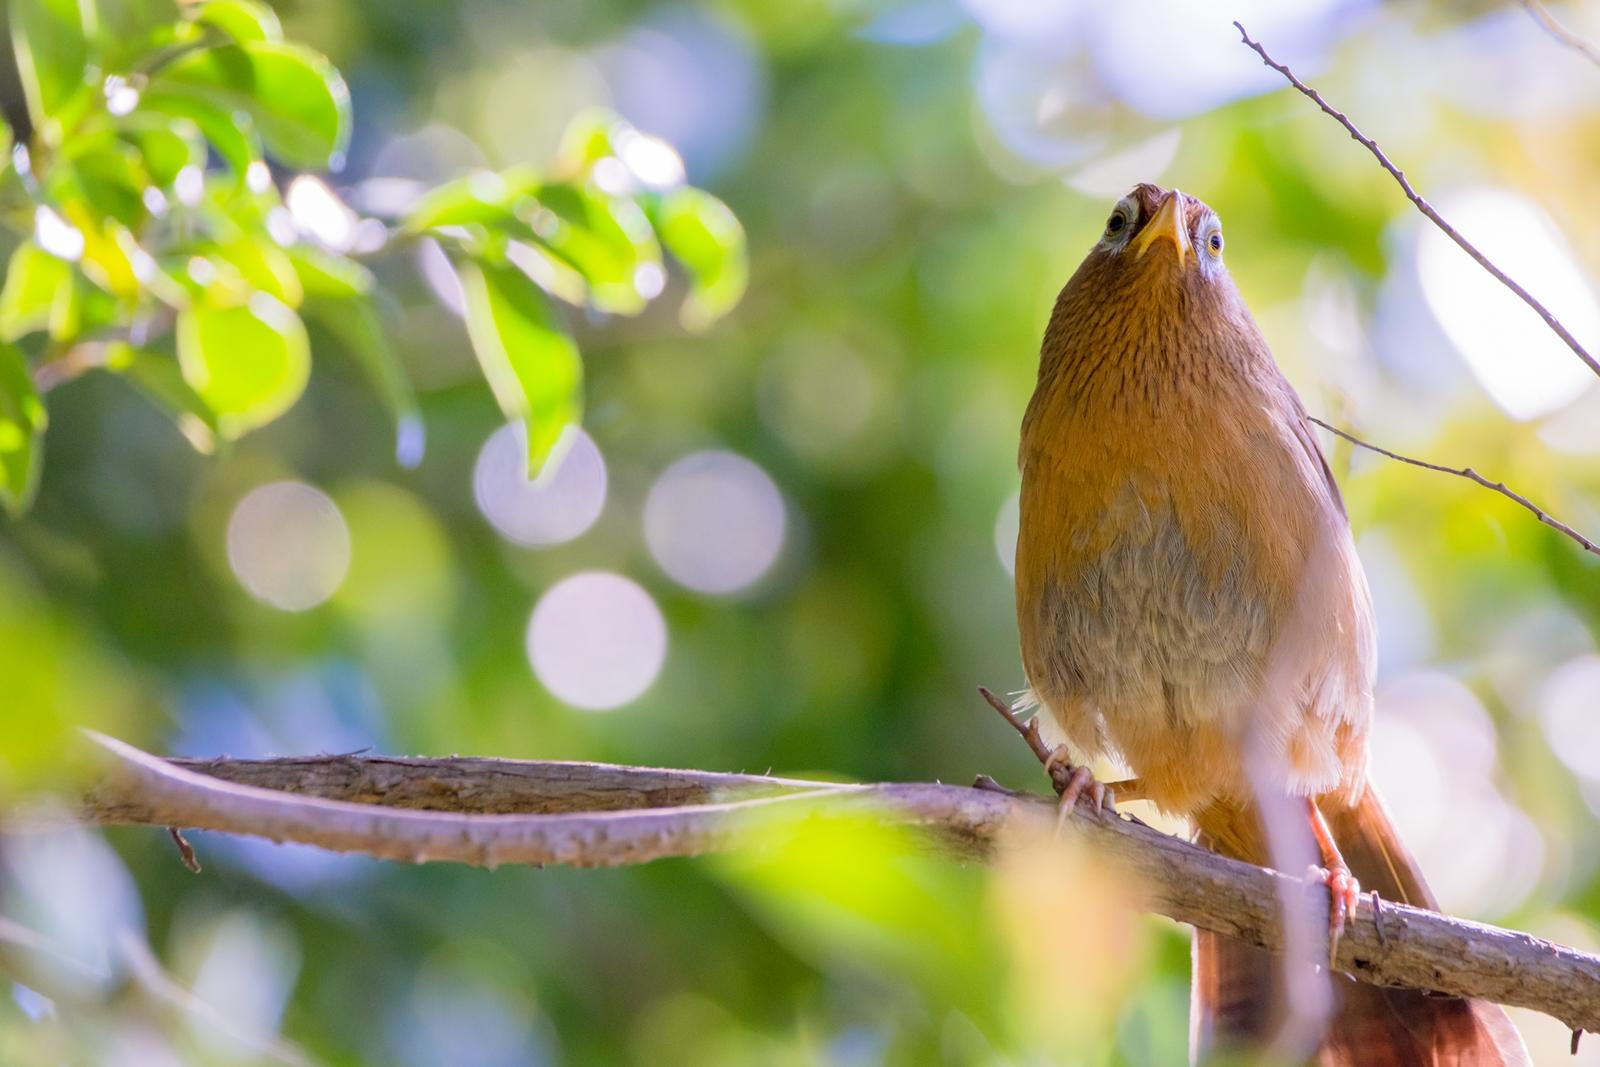 Photo: 「新緑のステージ」 / Stage of the fresh green.  光がそそぐ 心地よい光 さあ歌おうよ 新緑の歌を よろこびの歌を  Hwamei. (ガビチョウ)  Nikon D7200 SIGMA 150-600mm F5-6.3 DG OS HSM Contemporary  #birdphotography #birds #kawaii #ことり #小鳥 #nikon #sigma  ( http://takafumiooshio.com/archives/2454 )